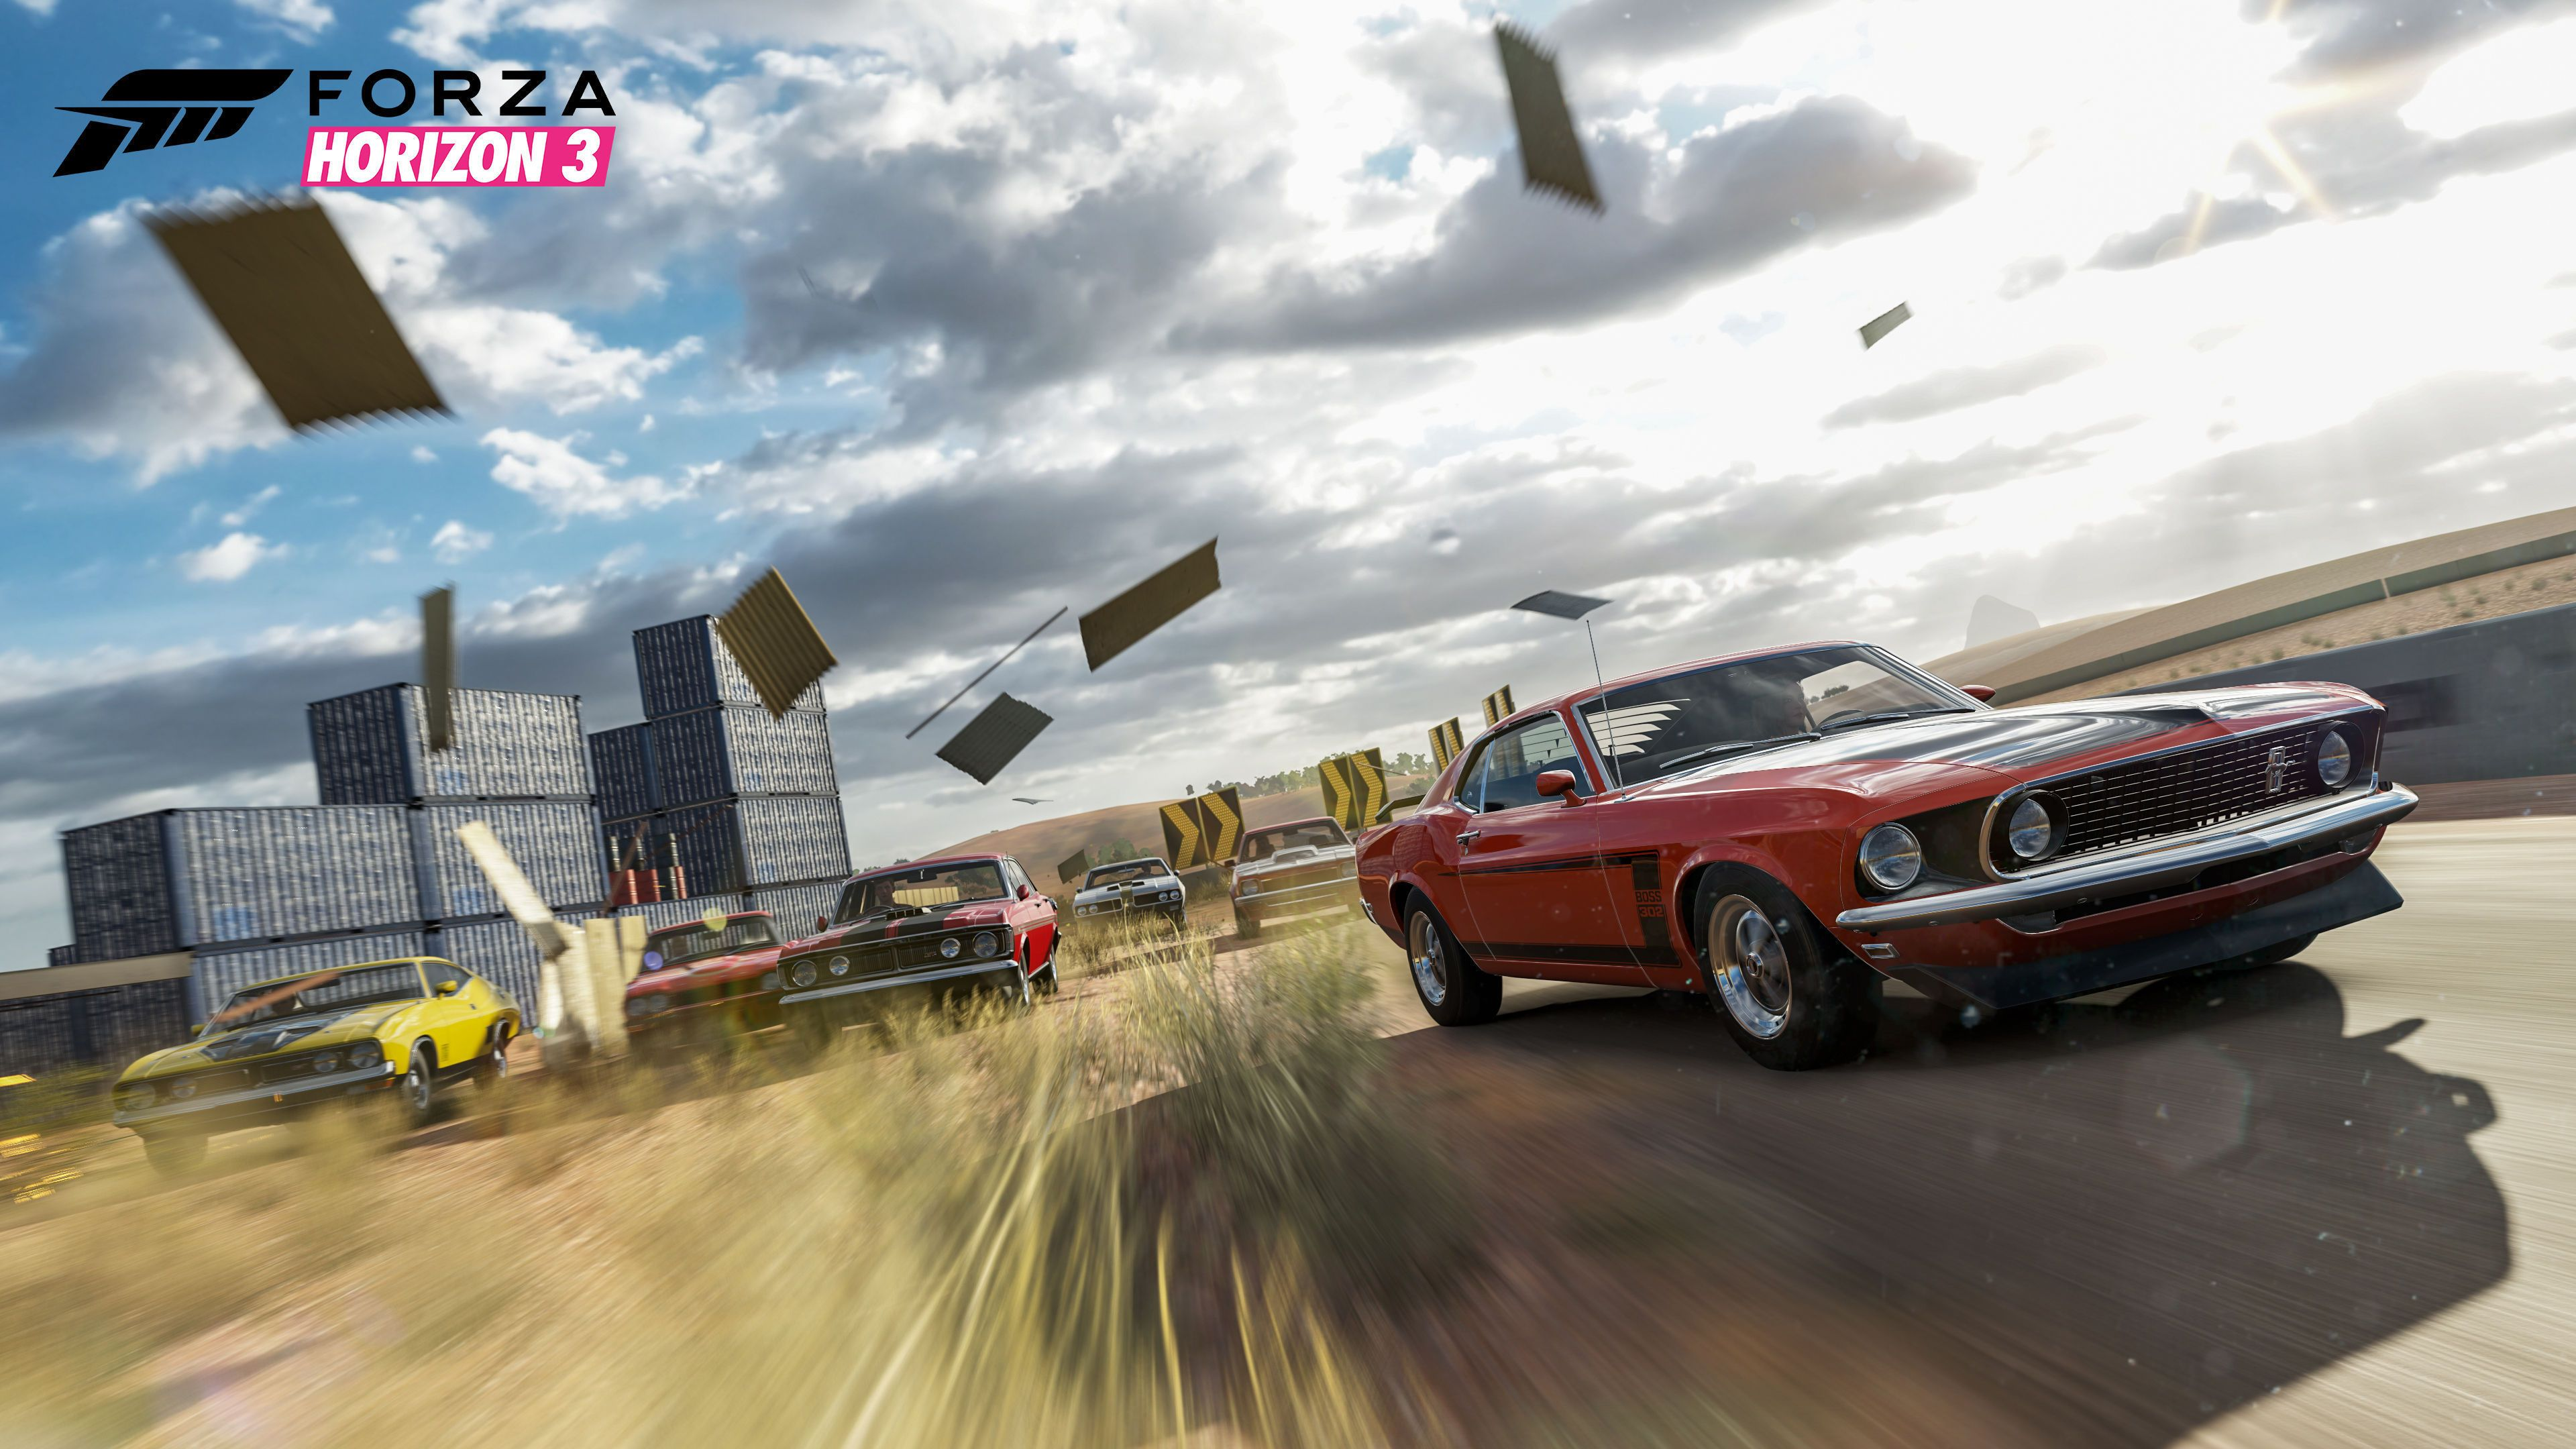 Wallpaper HD Forza Horizon 3 #Forza #XboxOne #ForzaHorizon3